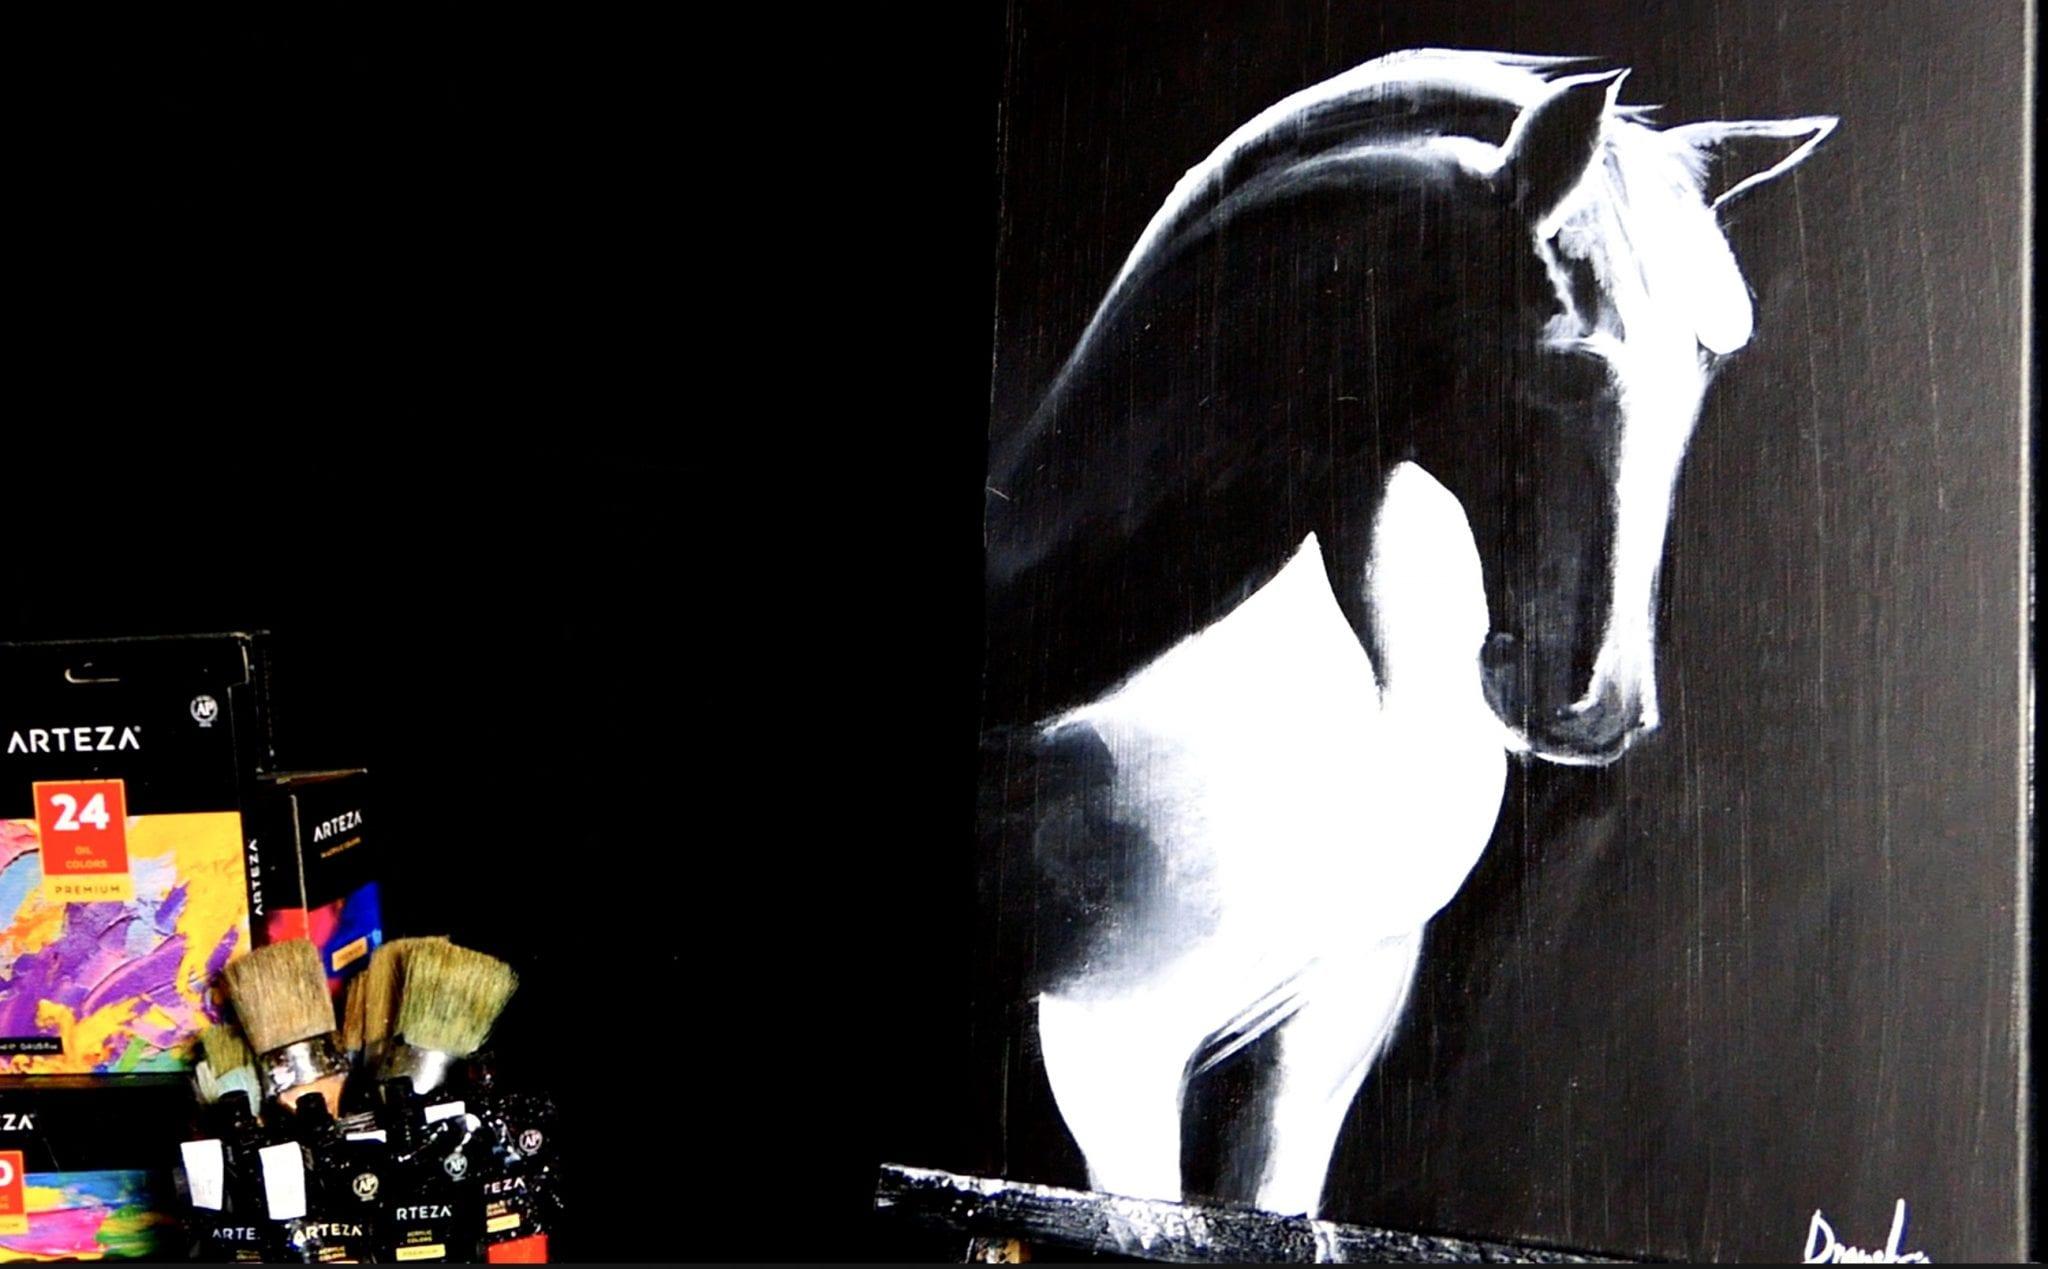 White Horse 1 Color Painting Techniques Acrylics Dranitsin Urartstudio